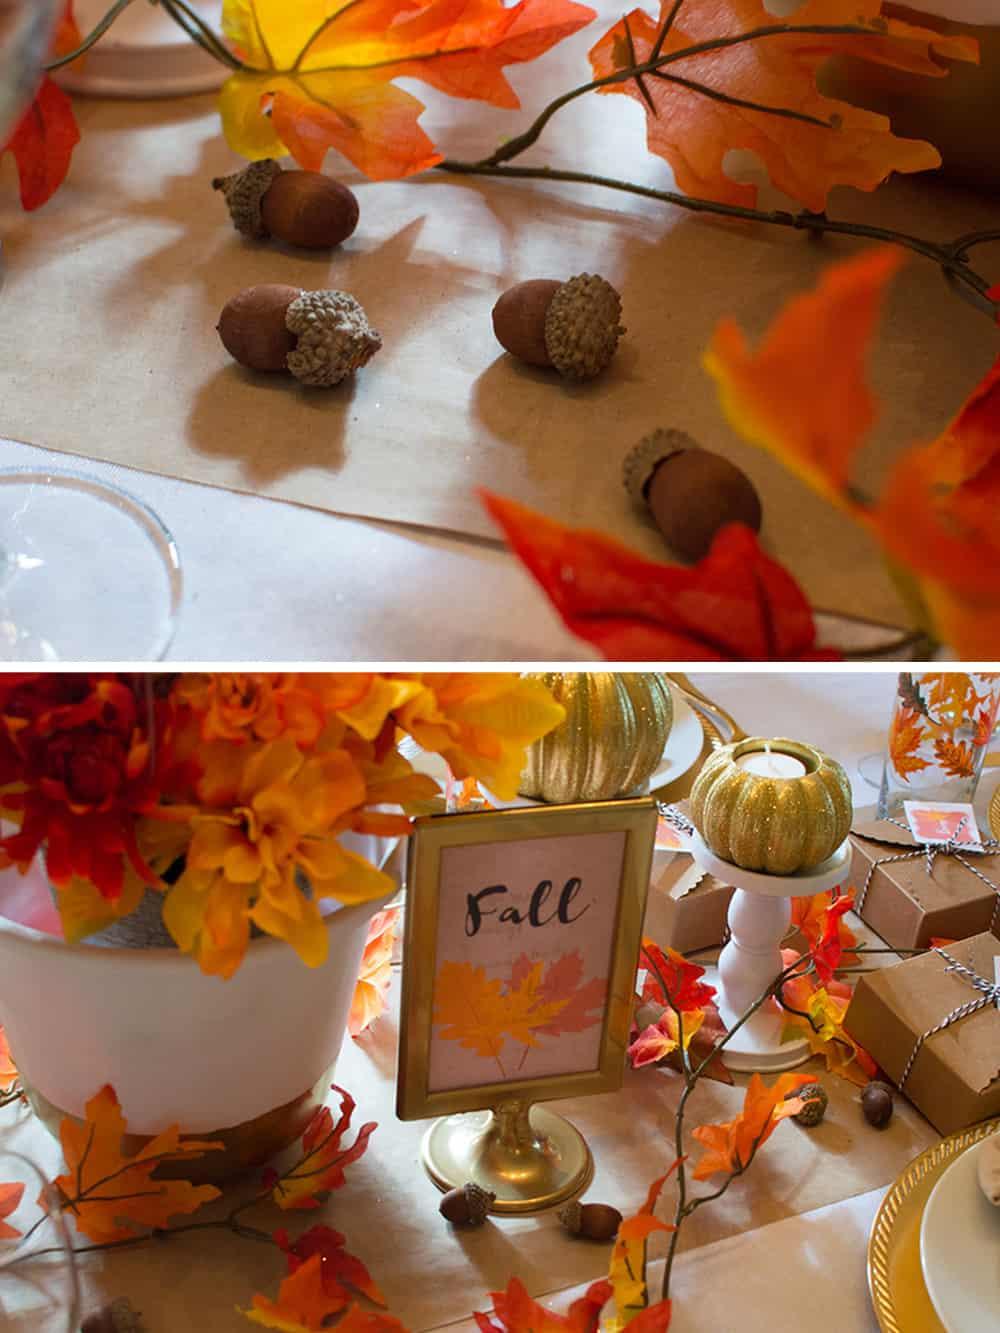 Acorn details on this Festive Fall Tablescape from Elva M Design Studio